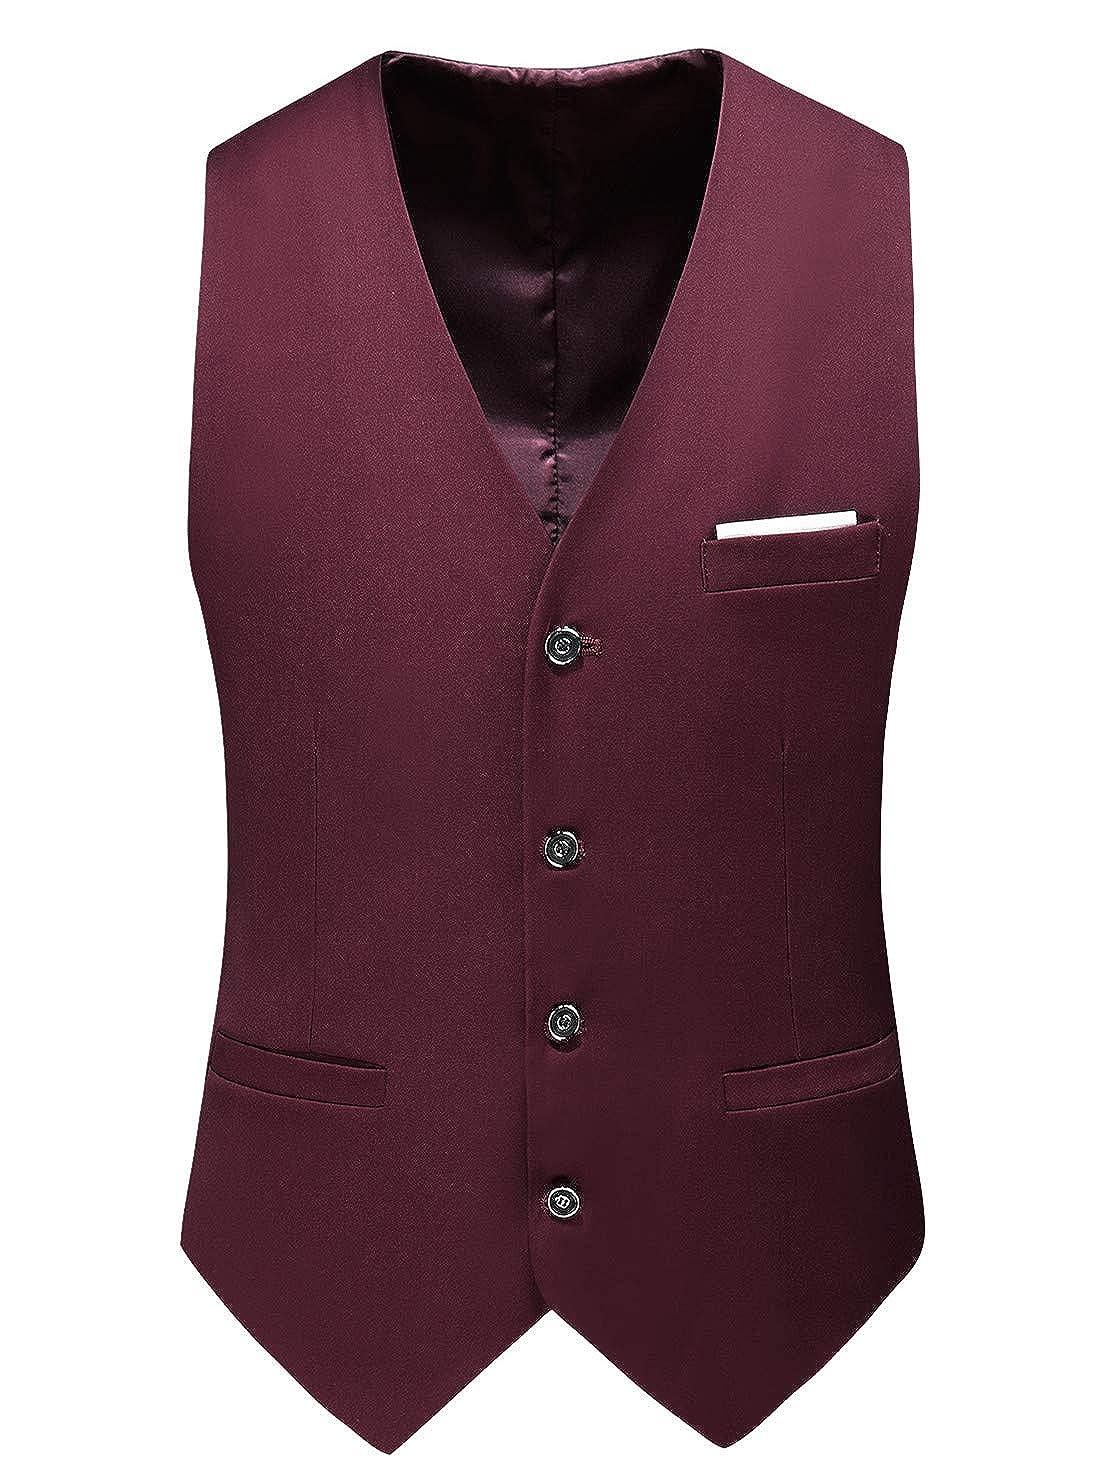 Amazon.com: MOGU Chaleco para hombre, traje casual, 13 ...